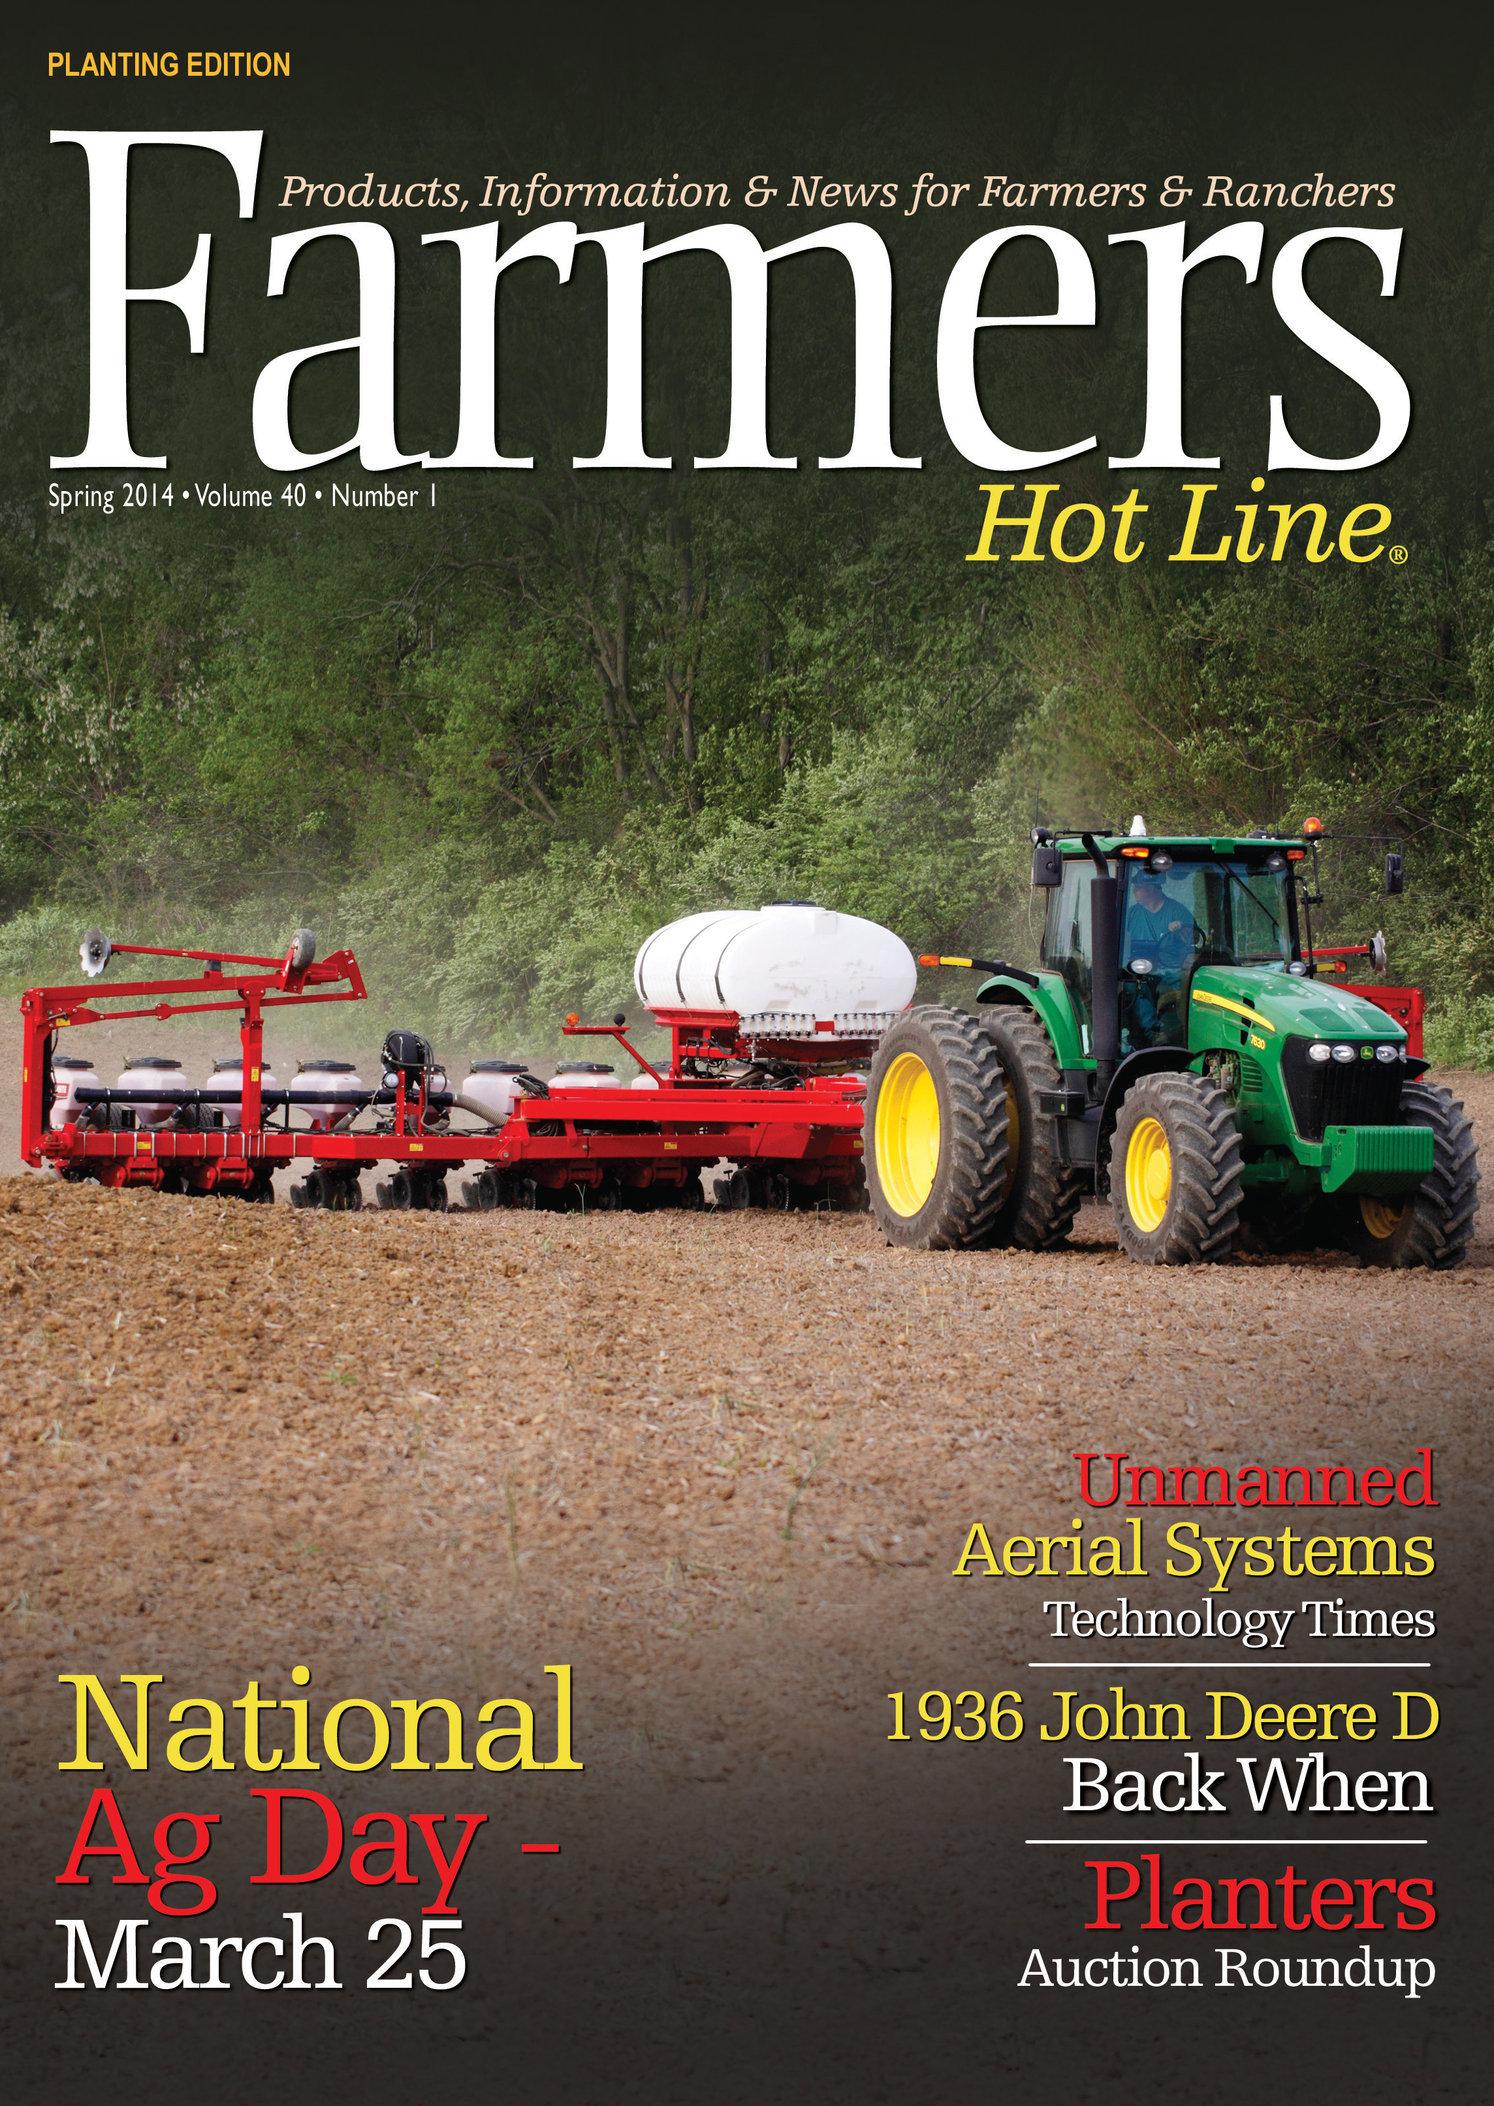 Farmers Hot Line Magazine; © Spring 2014